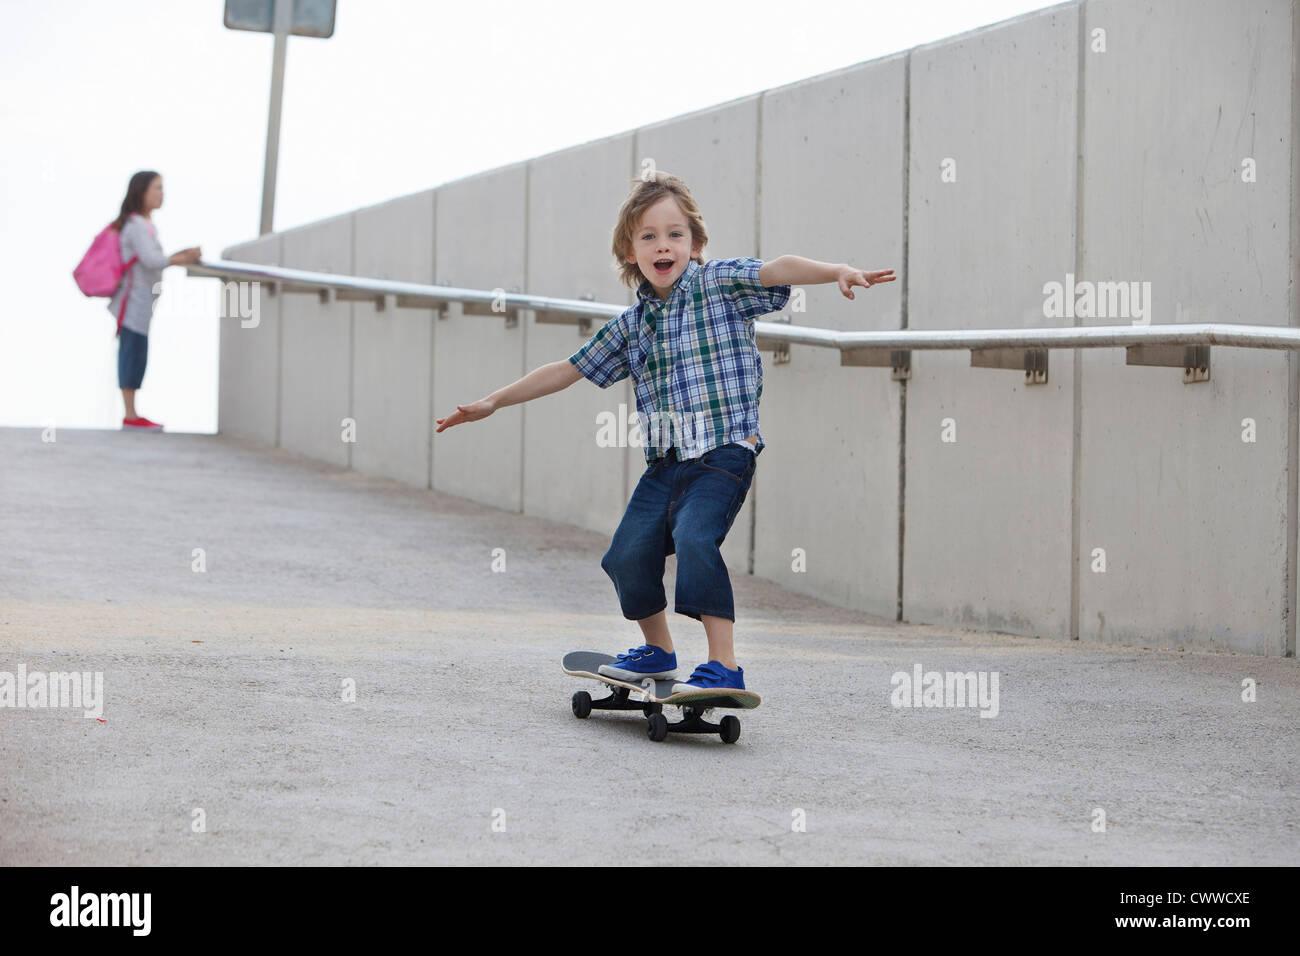 2147f3cb Skateboard Girl Ramp Stock Photos & Skateboard Girl Ramp Stock ...